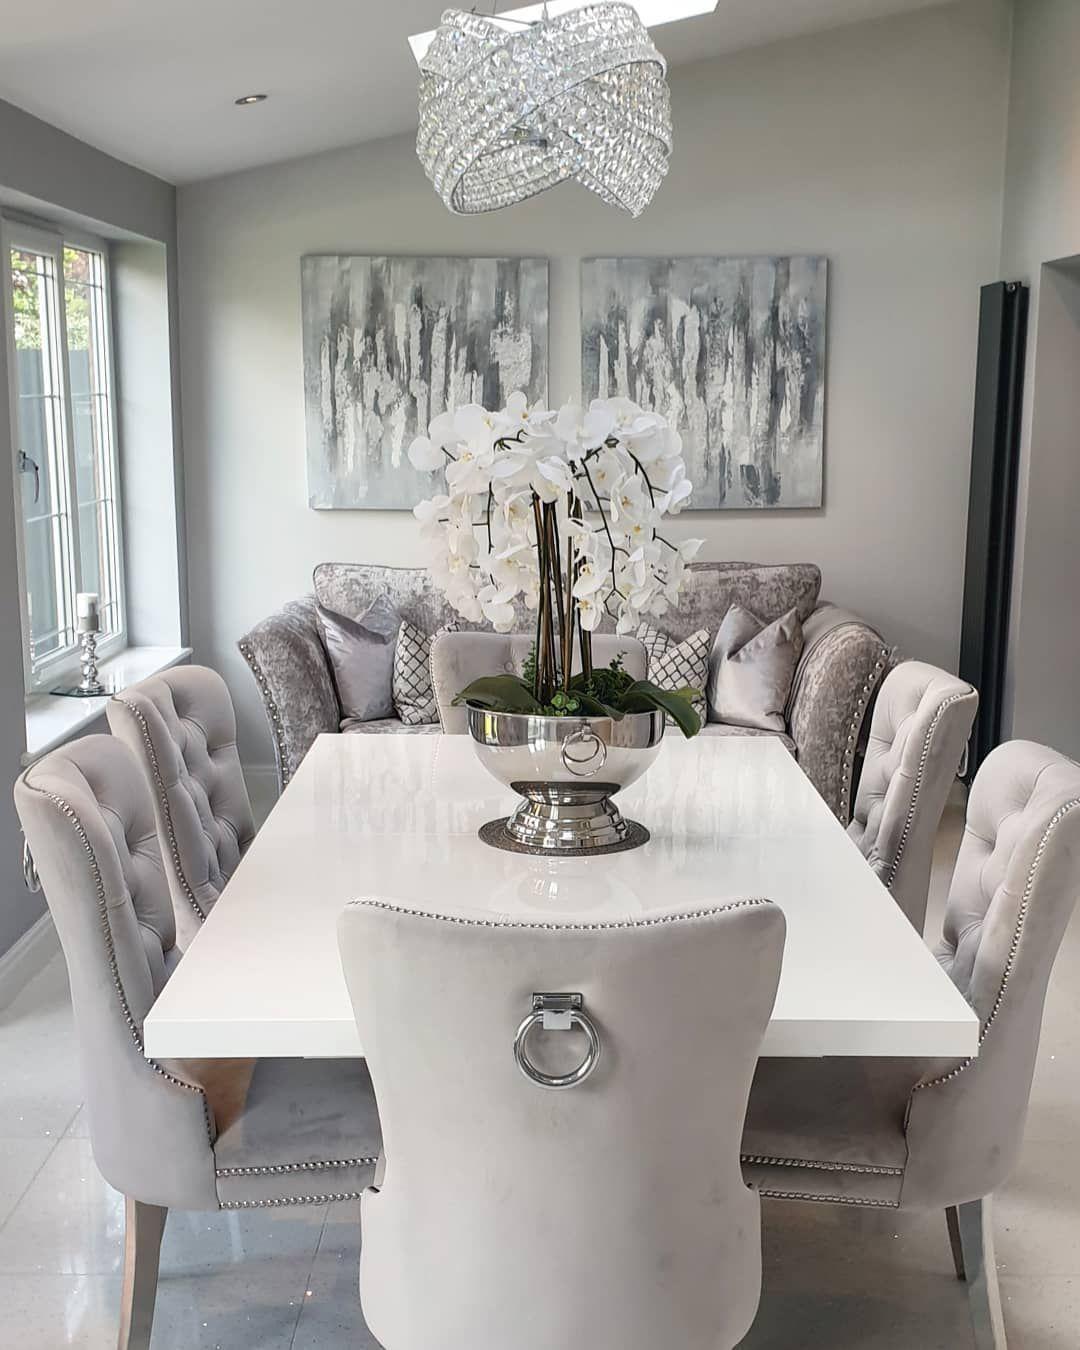 Brielle Tufted Armless Dining Chair Decor Home Living Room Dinning Room Decor Dining Room Table Decor